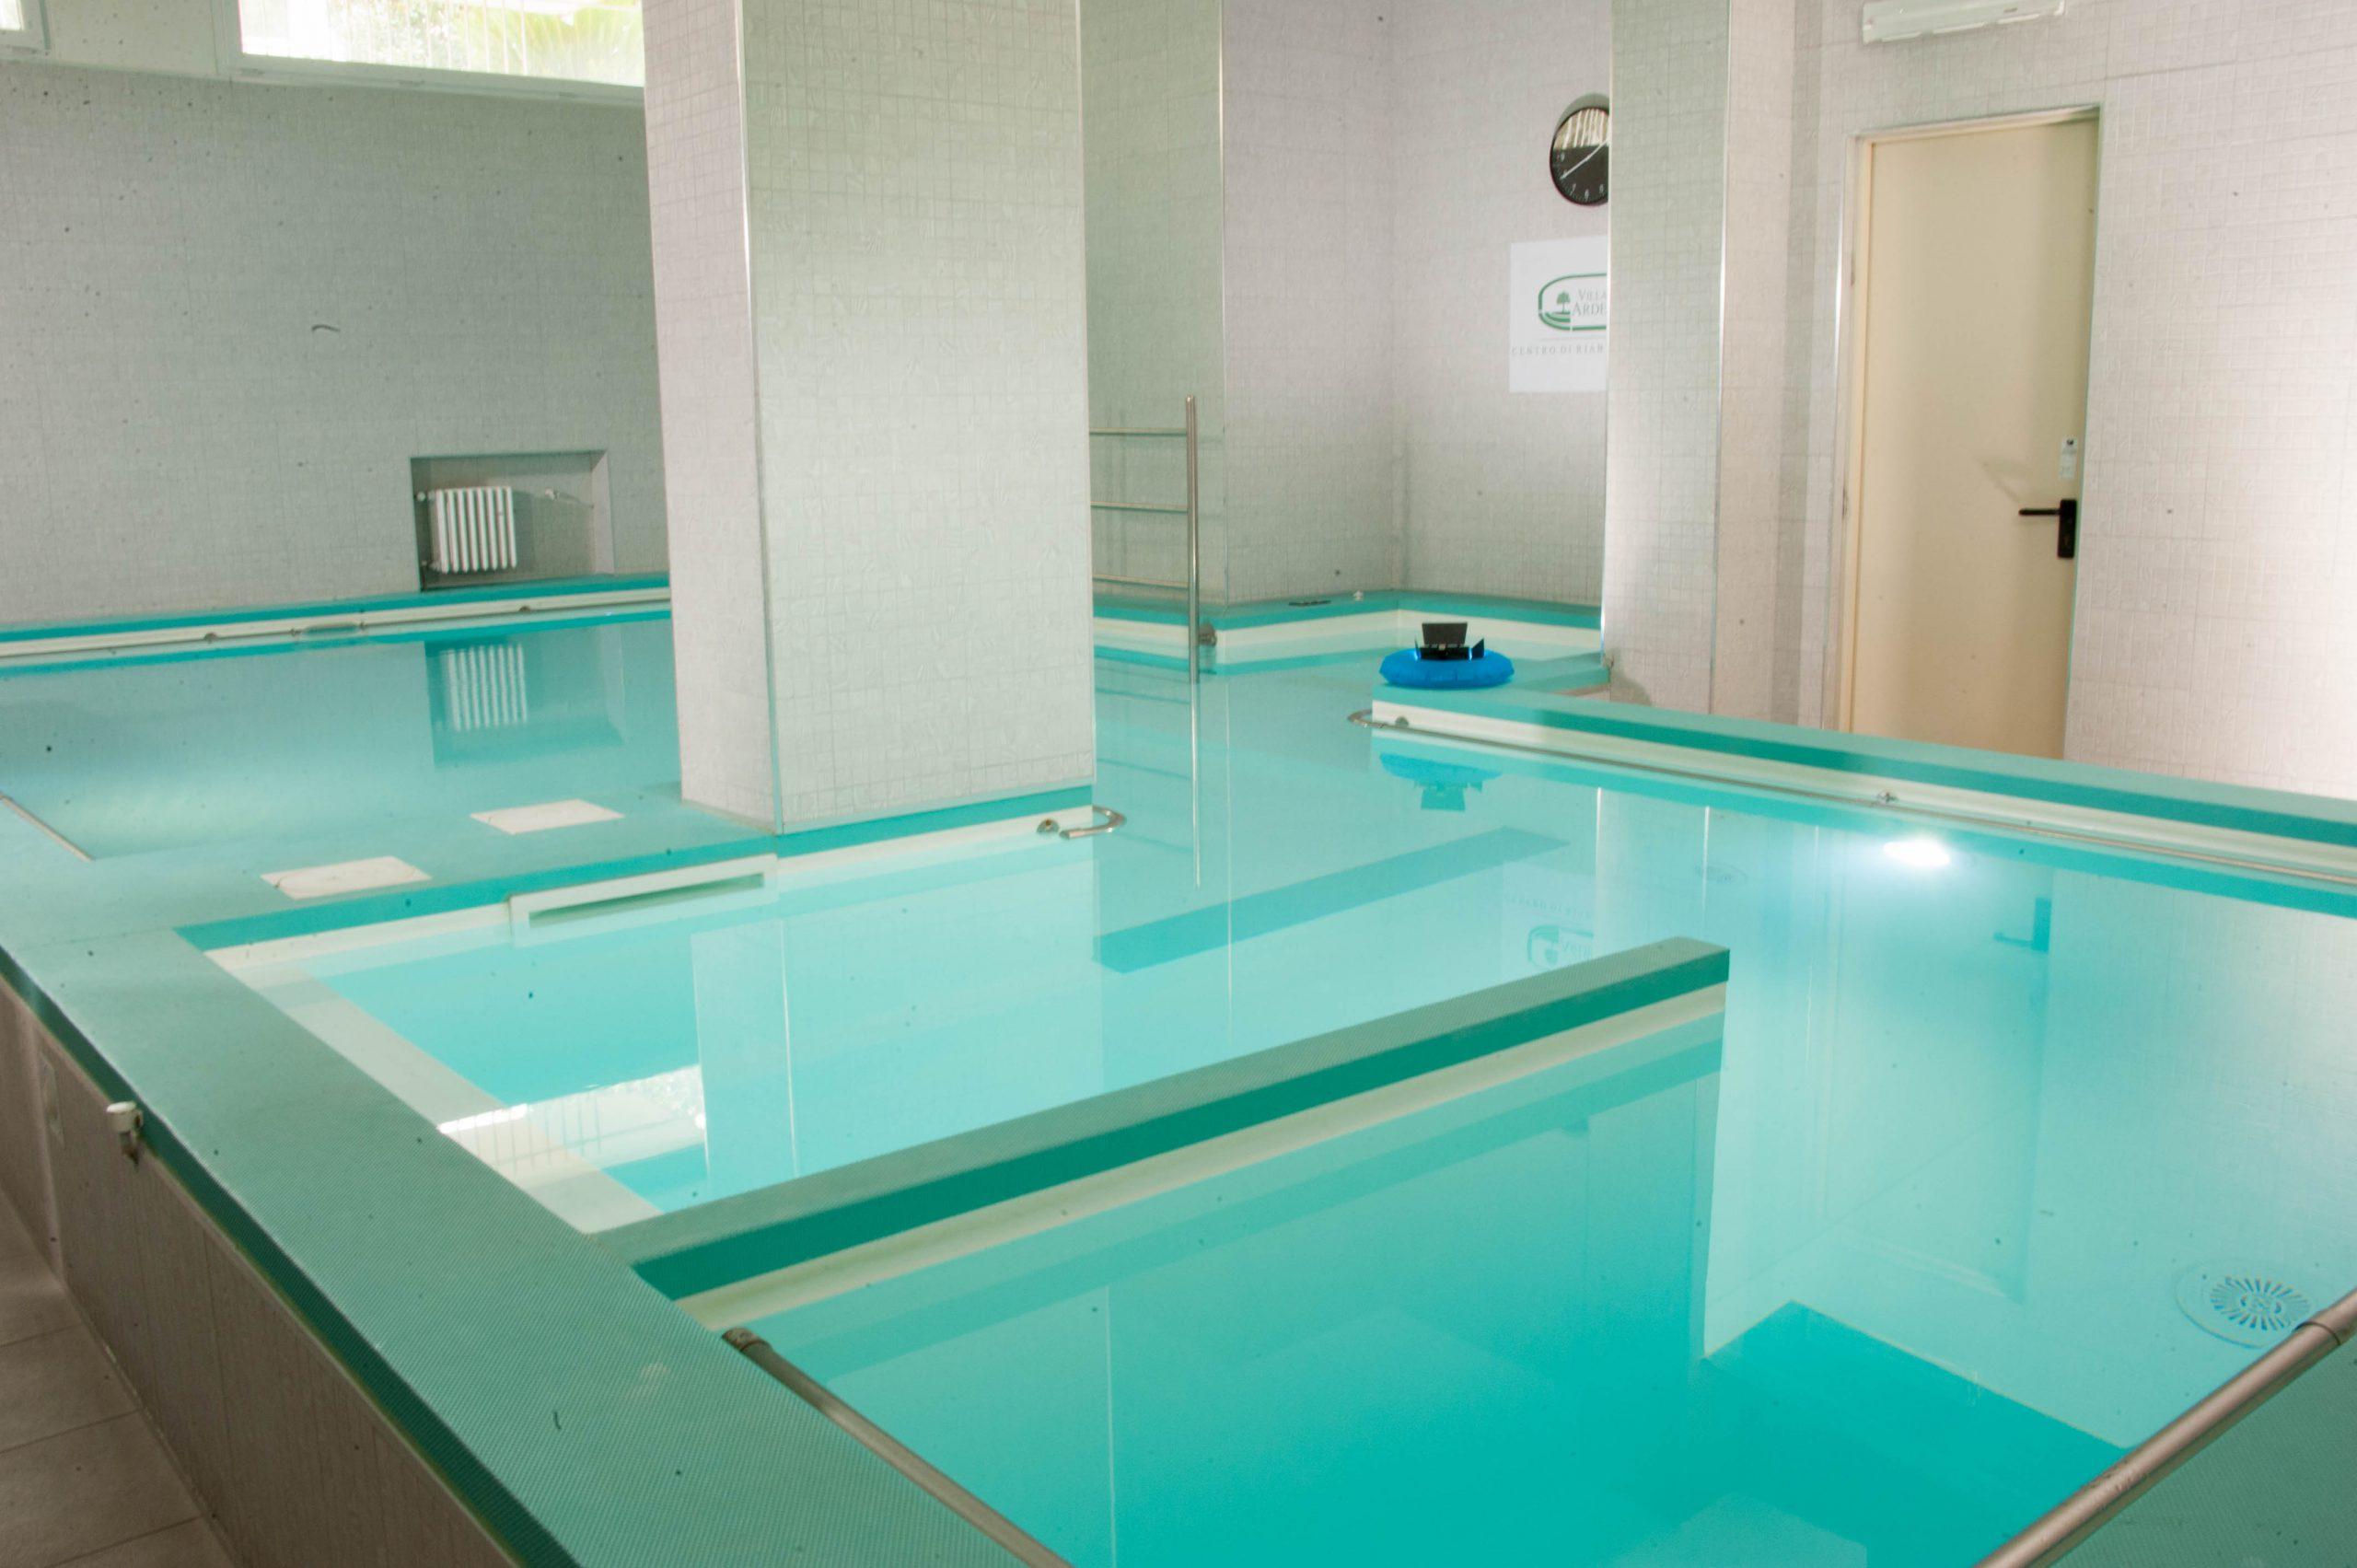 piscina idrokinesiterapia